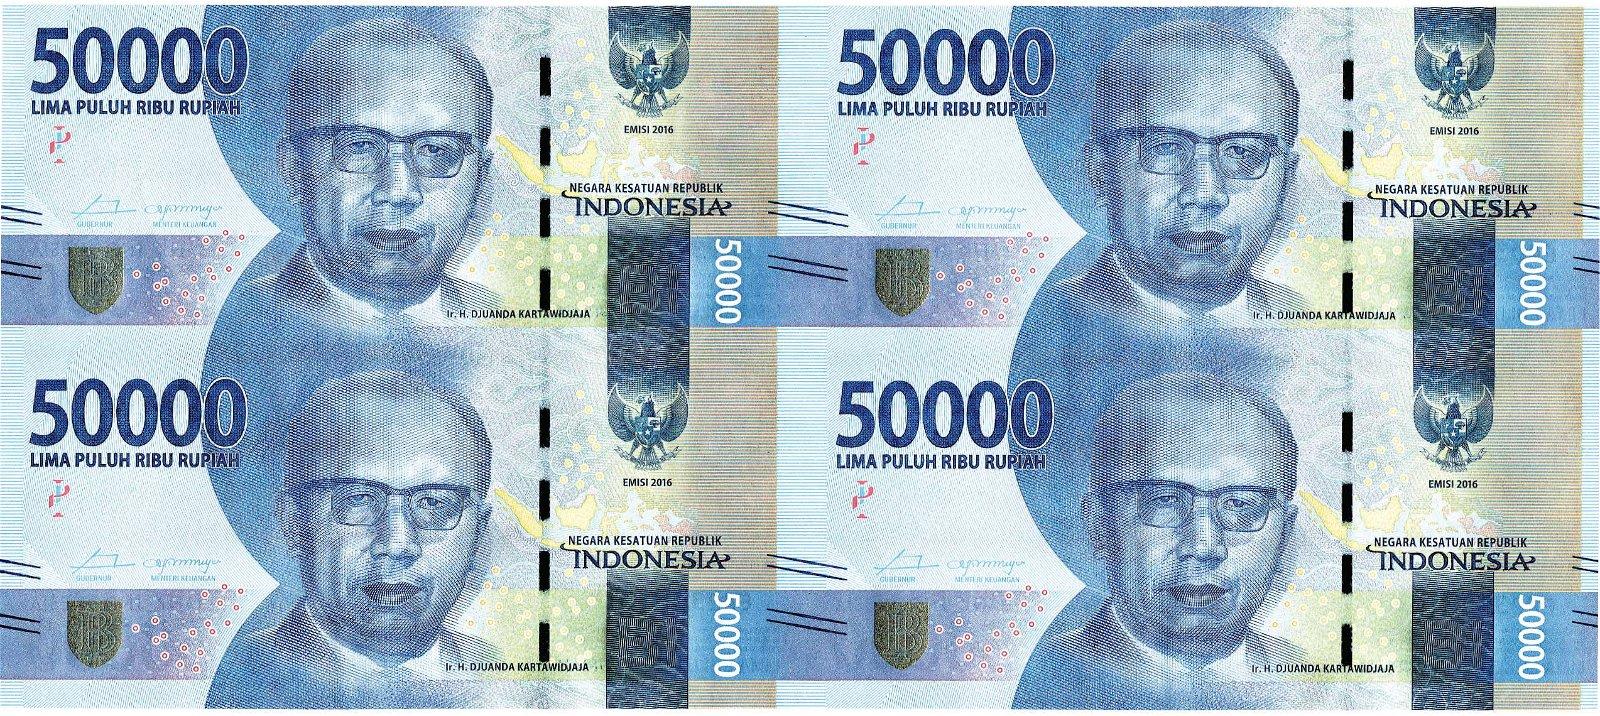 Indonesia, 50,000 Rupiah S/no. EAO 345350 Uncut sheets